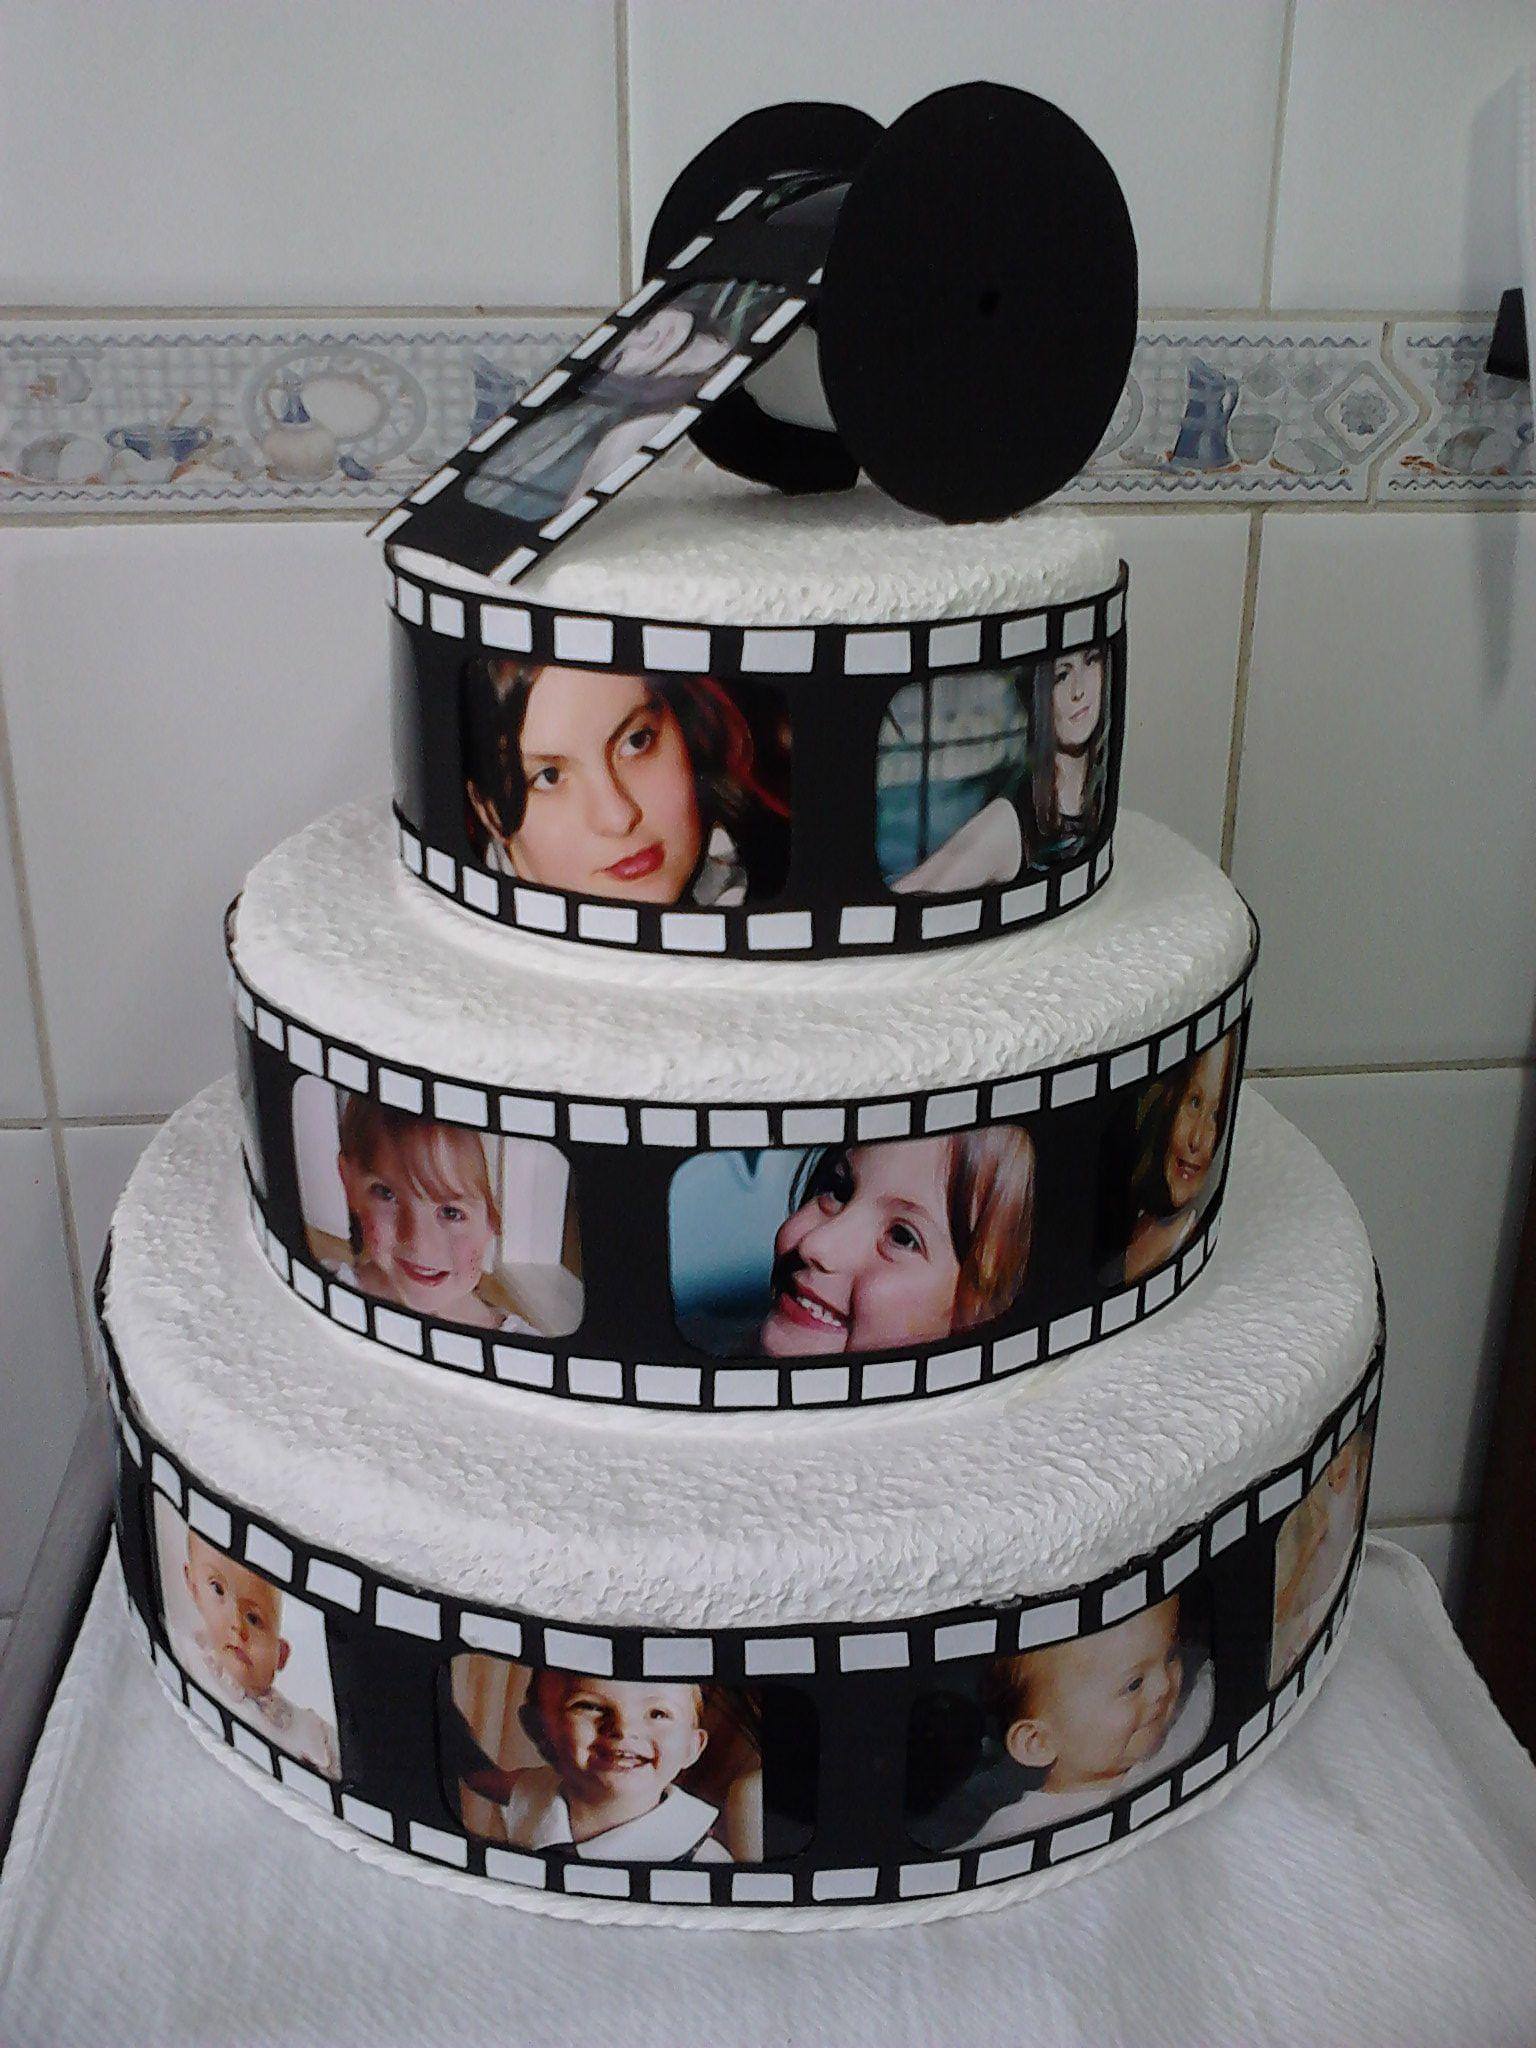 Cake Artista : Cake cine Cine Pinterest Cakes